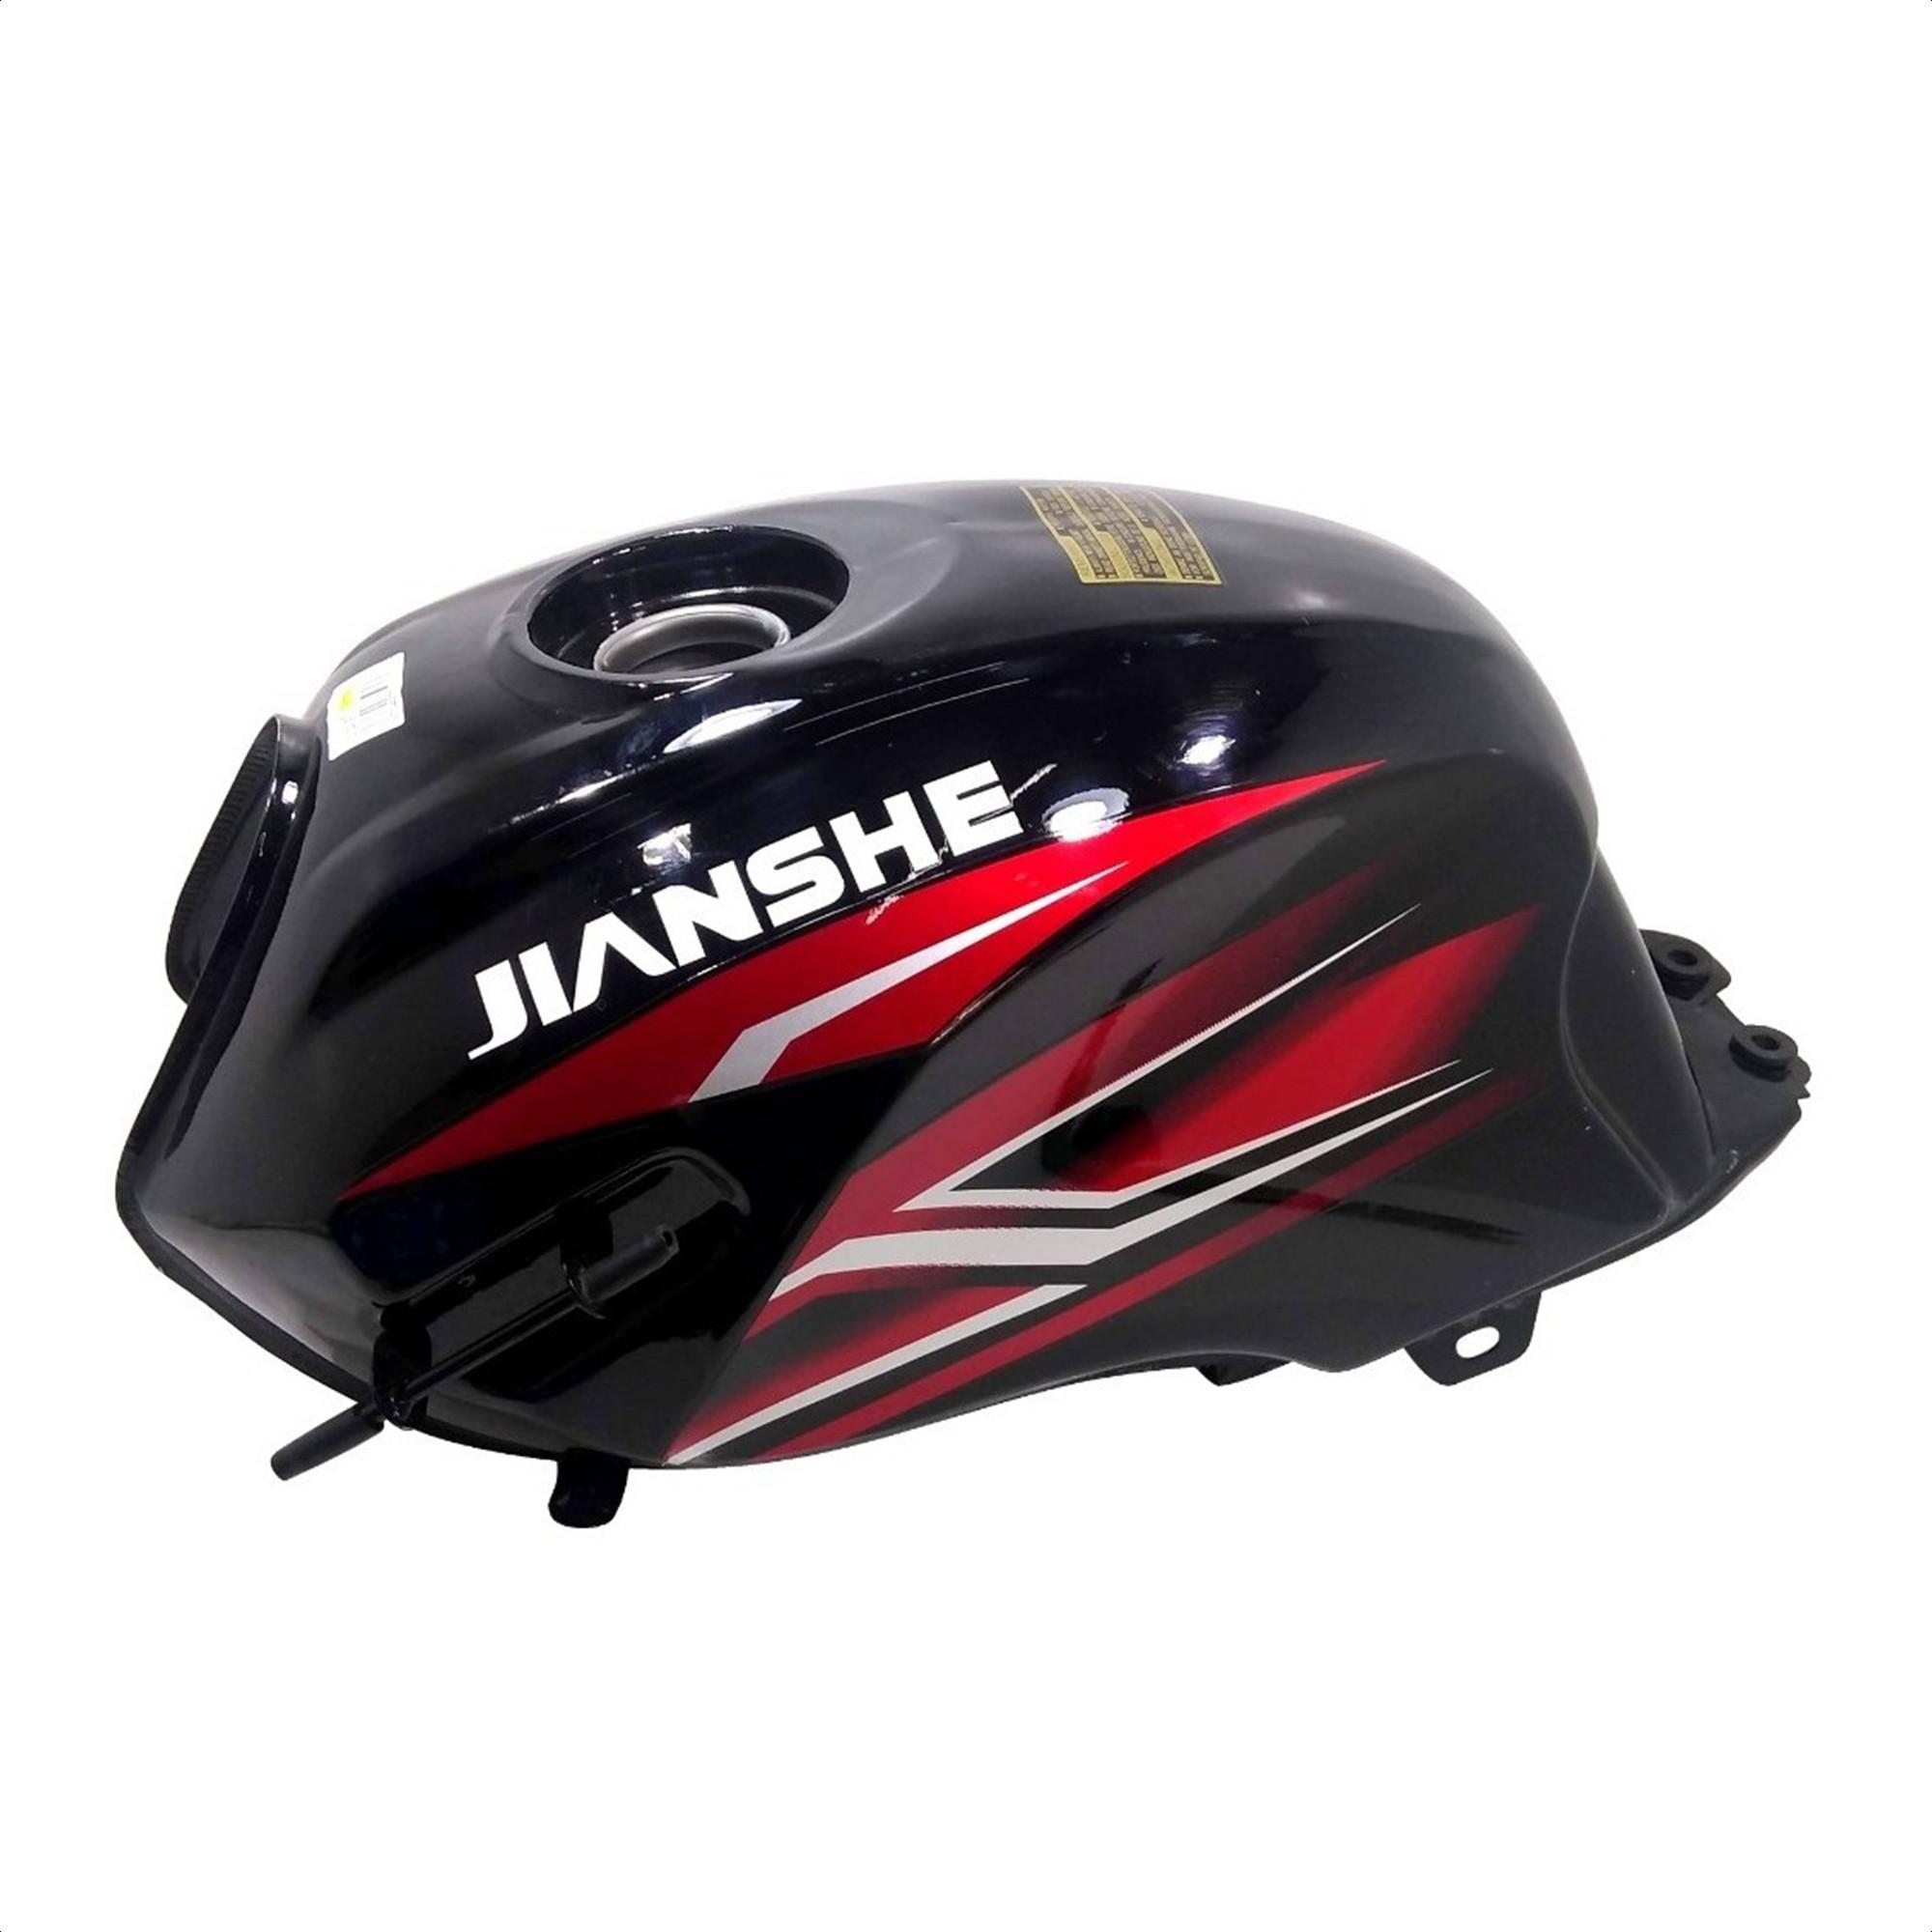 Tanque Jianshe 6by 150 Con Detalle Original